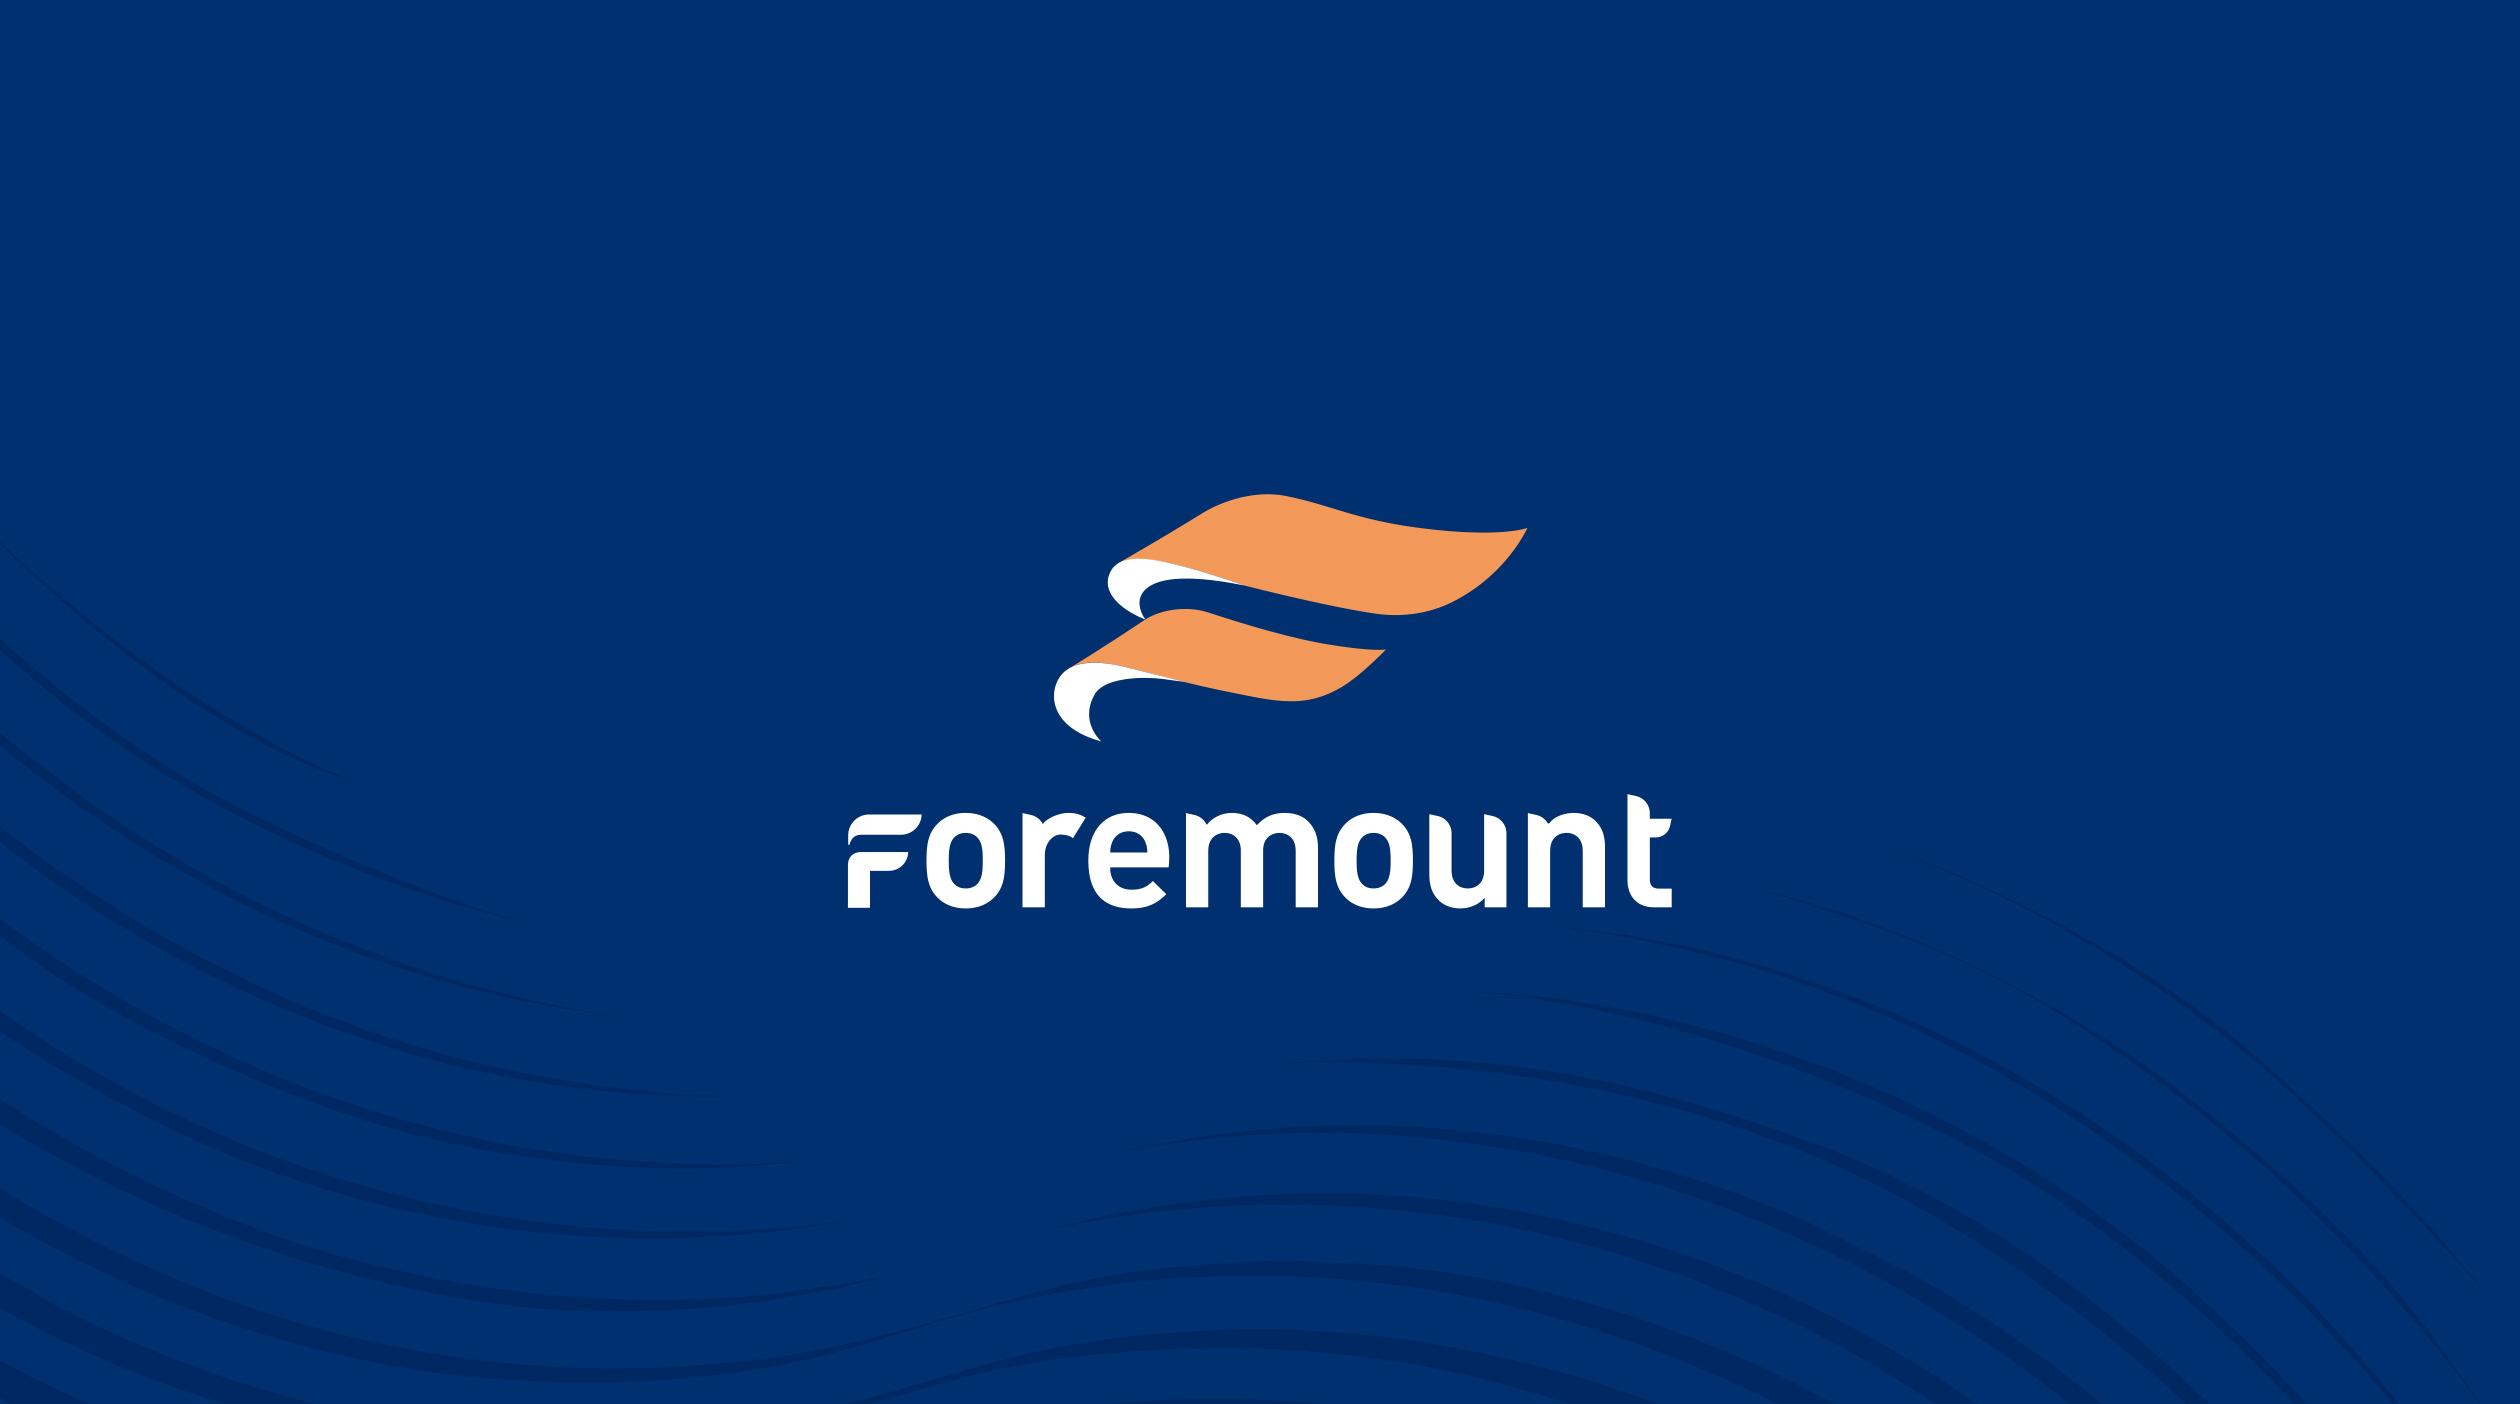 Foremount